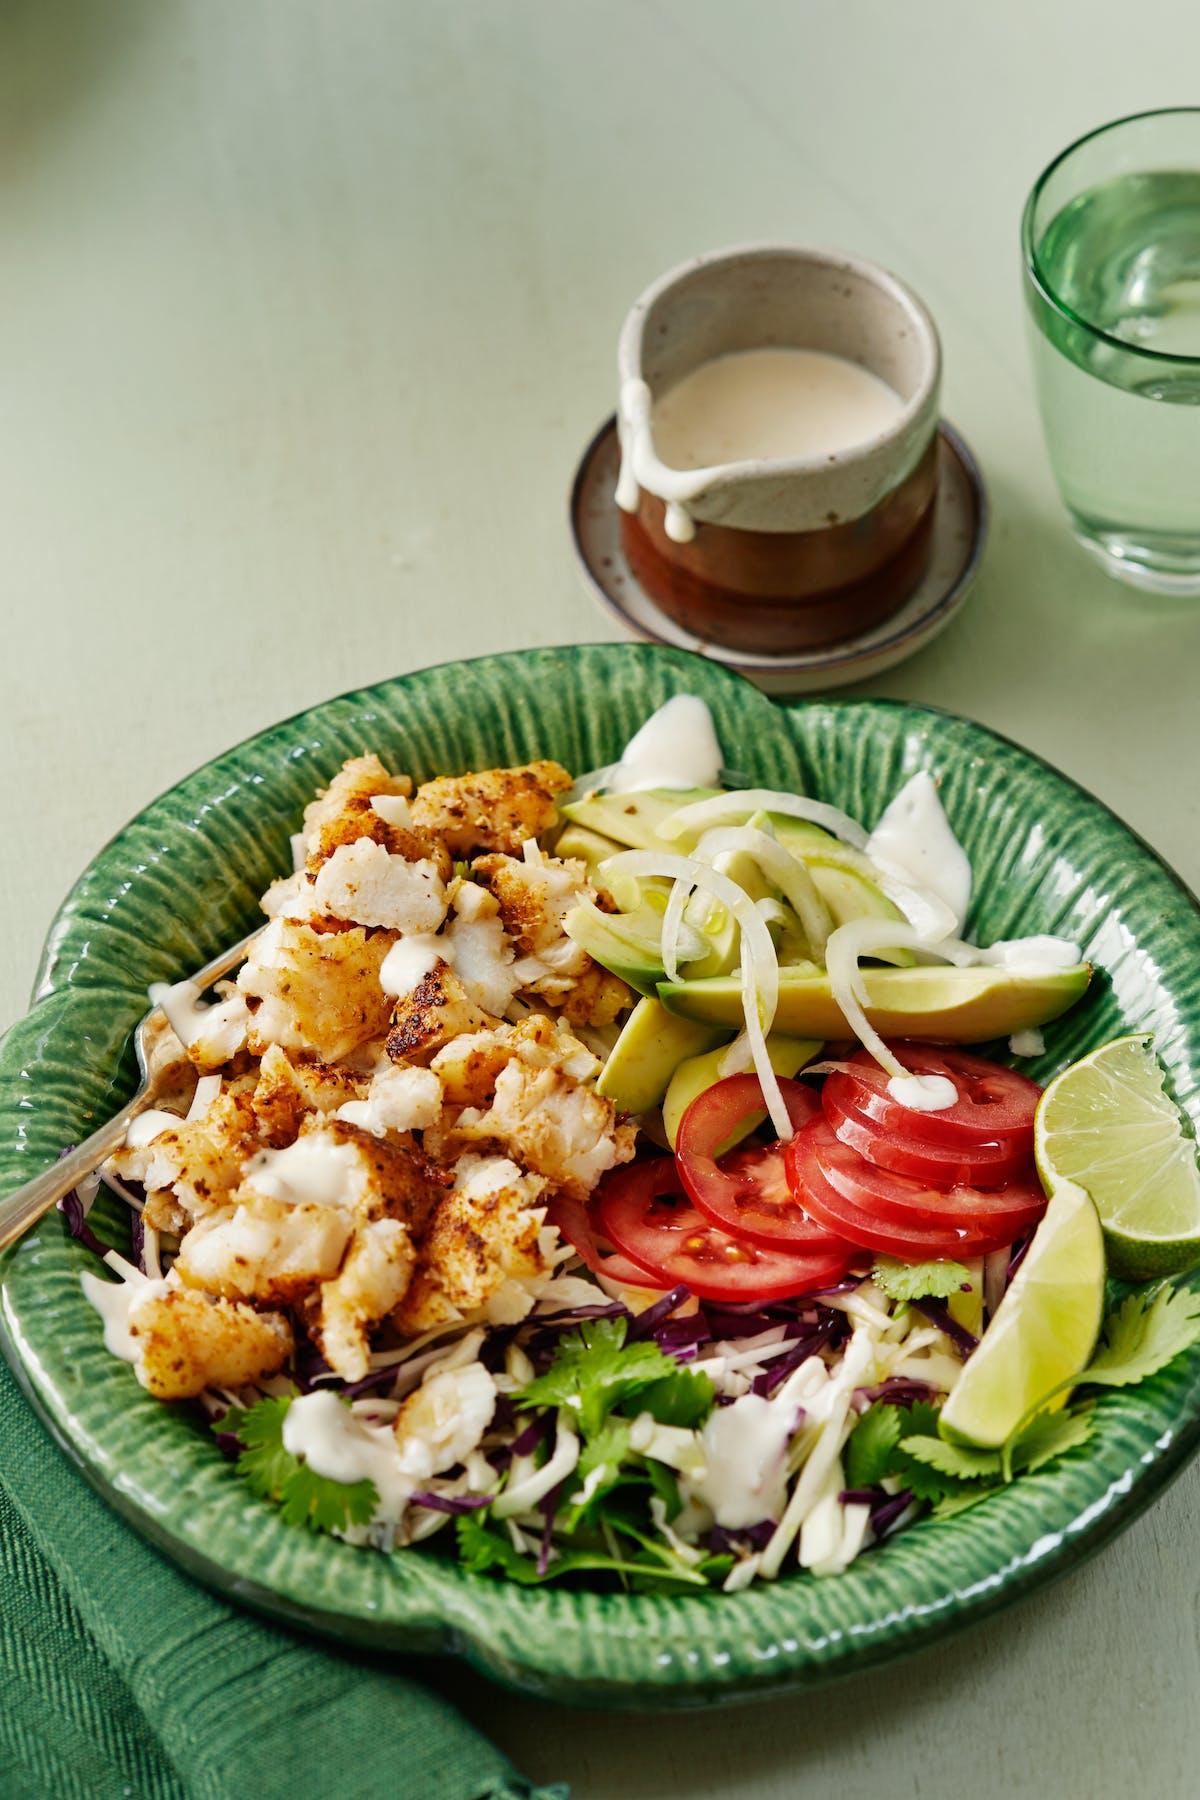 Low-carb fish taco bowl